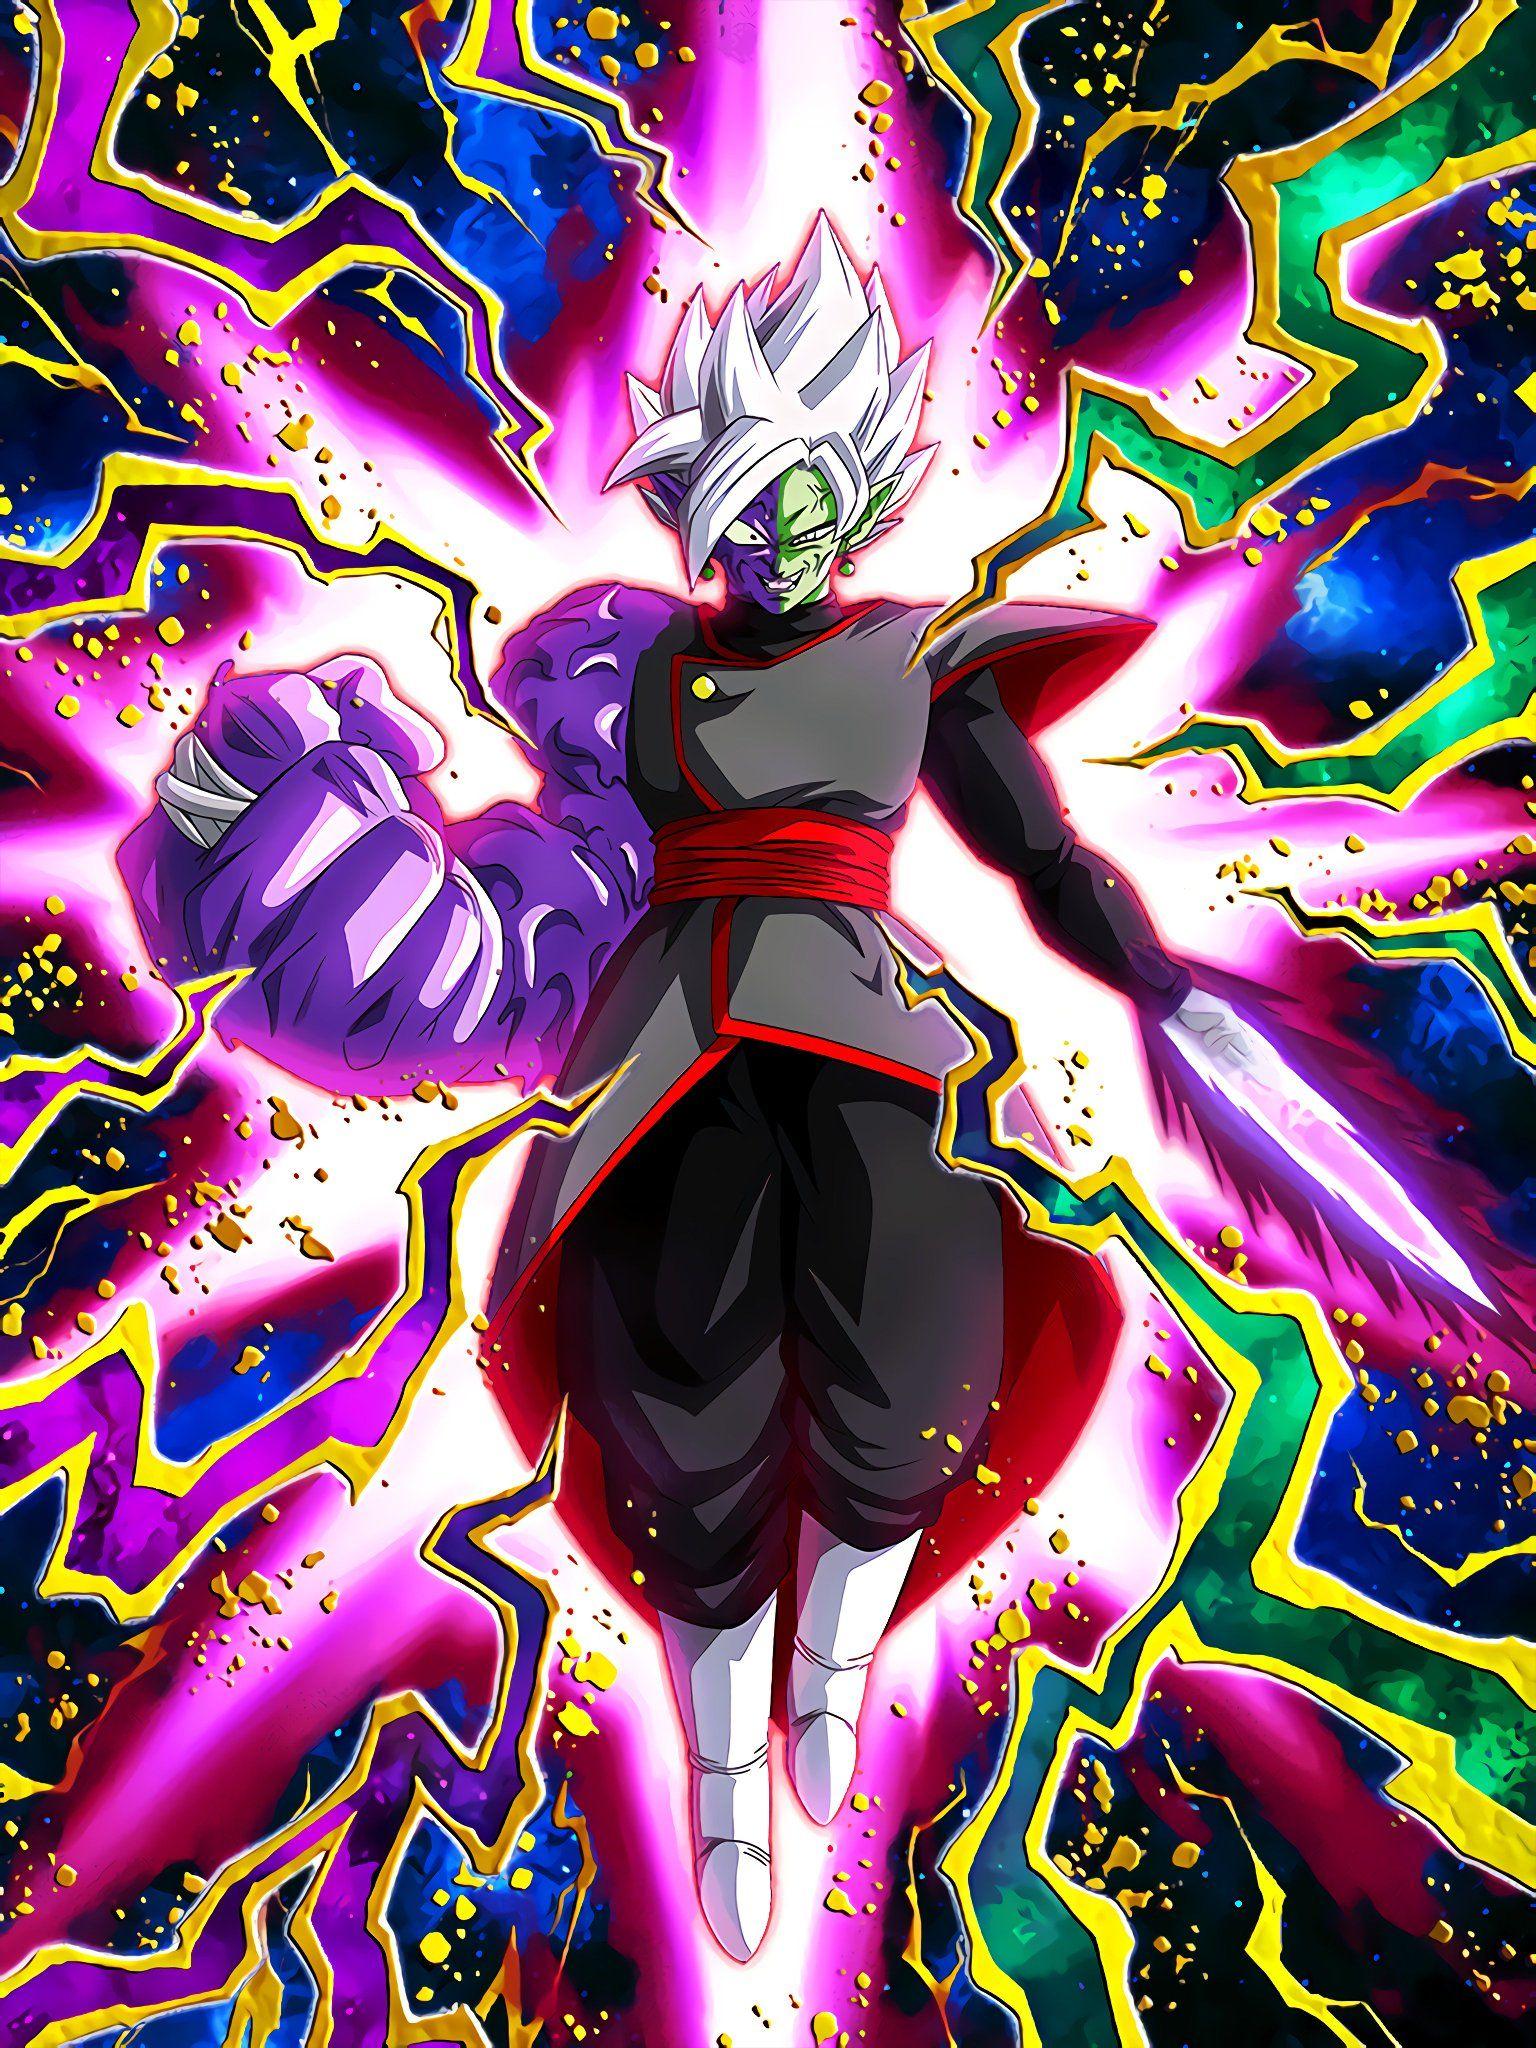 Hydros On Twitter Dragon Ball Artwork Anime Dragon Ball Super Dragon Ball Art